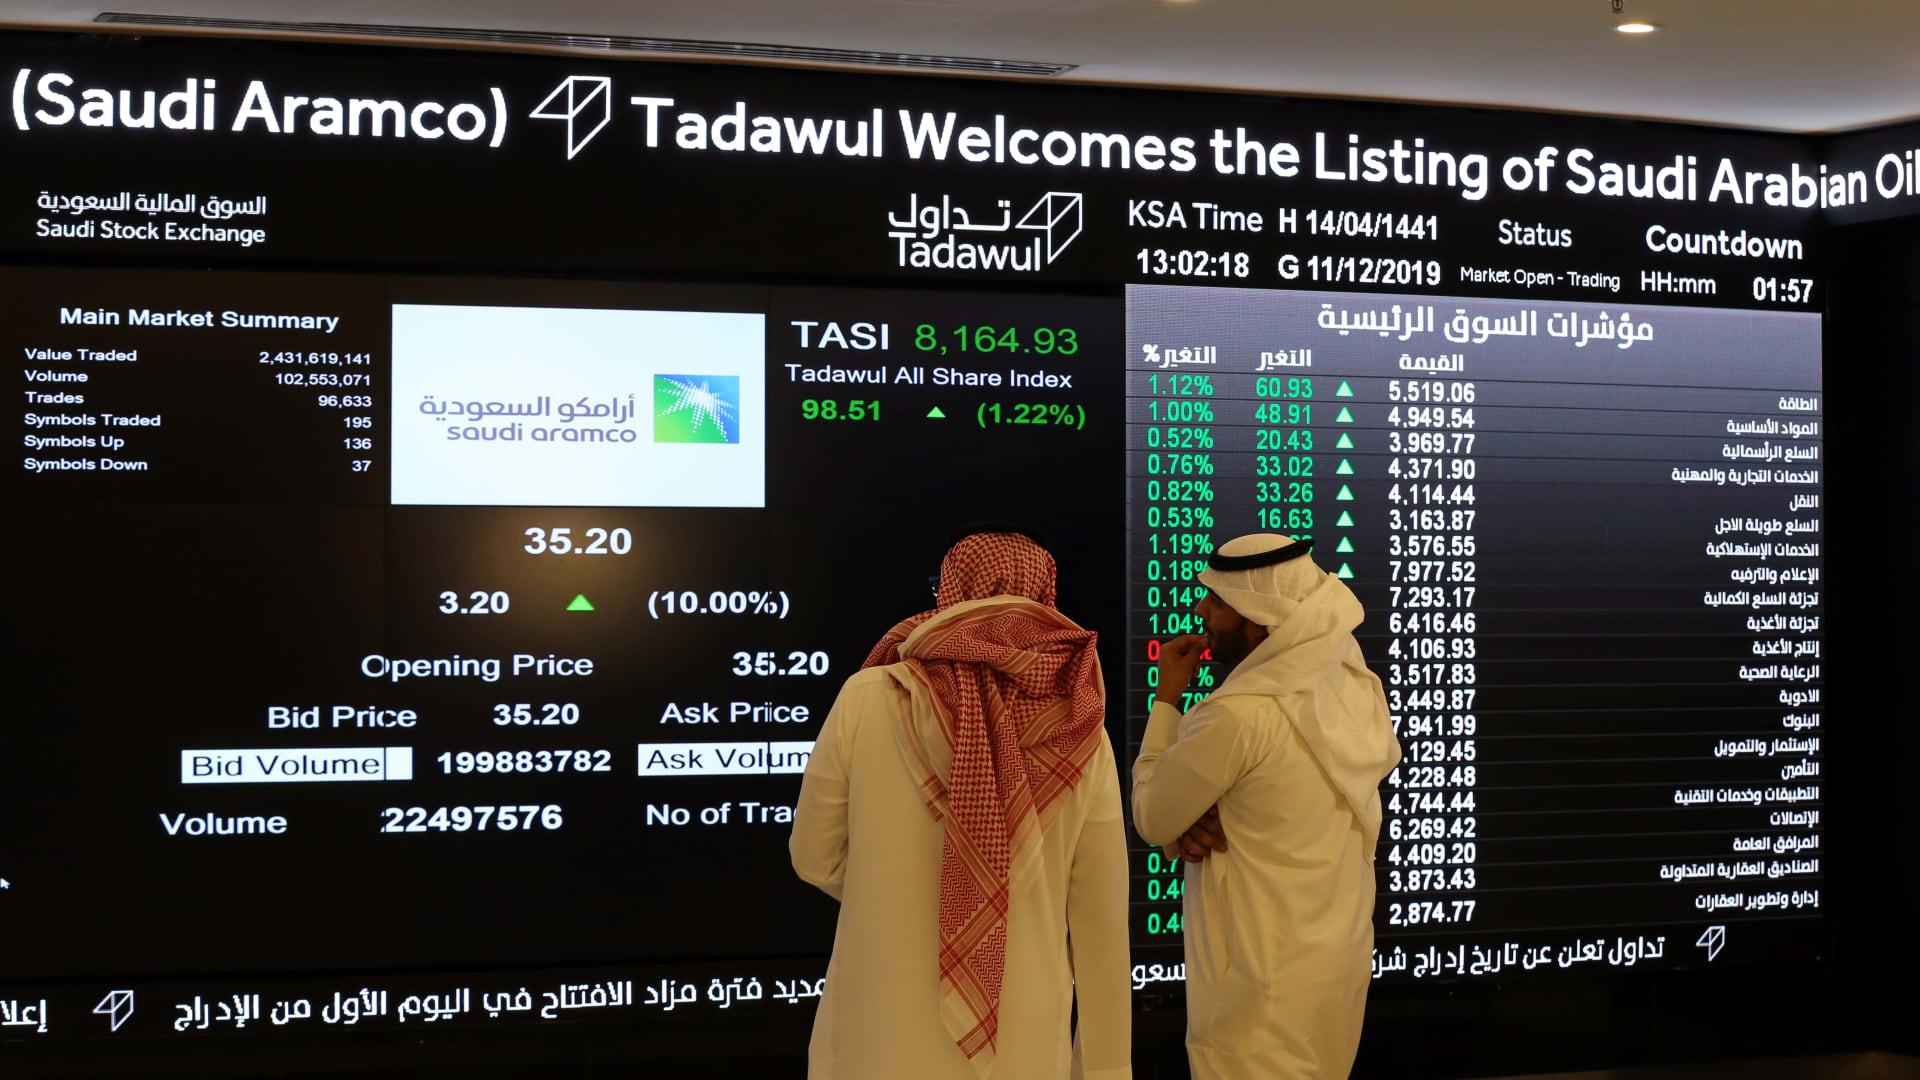 Investors monitor a screen displaying stock information at the Saudi Stock Exchange (Tadawul) following the debut of Saudi Aramco's initial public offering (IPO) on the Riyadh's stock market, in Riyadh, Saudi Arabia, December 11, 2019.